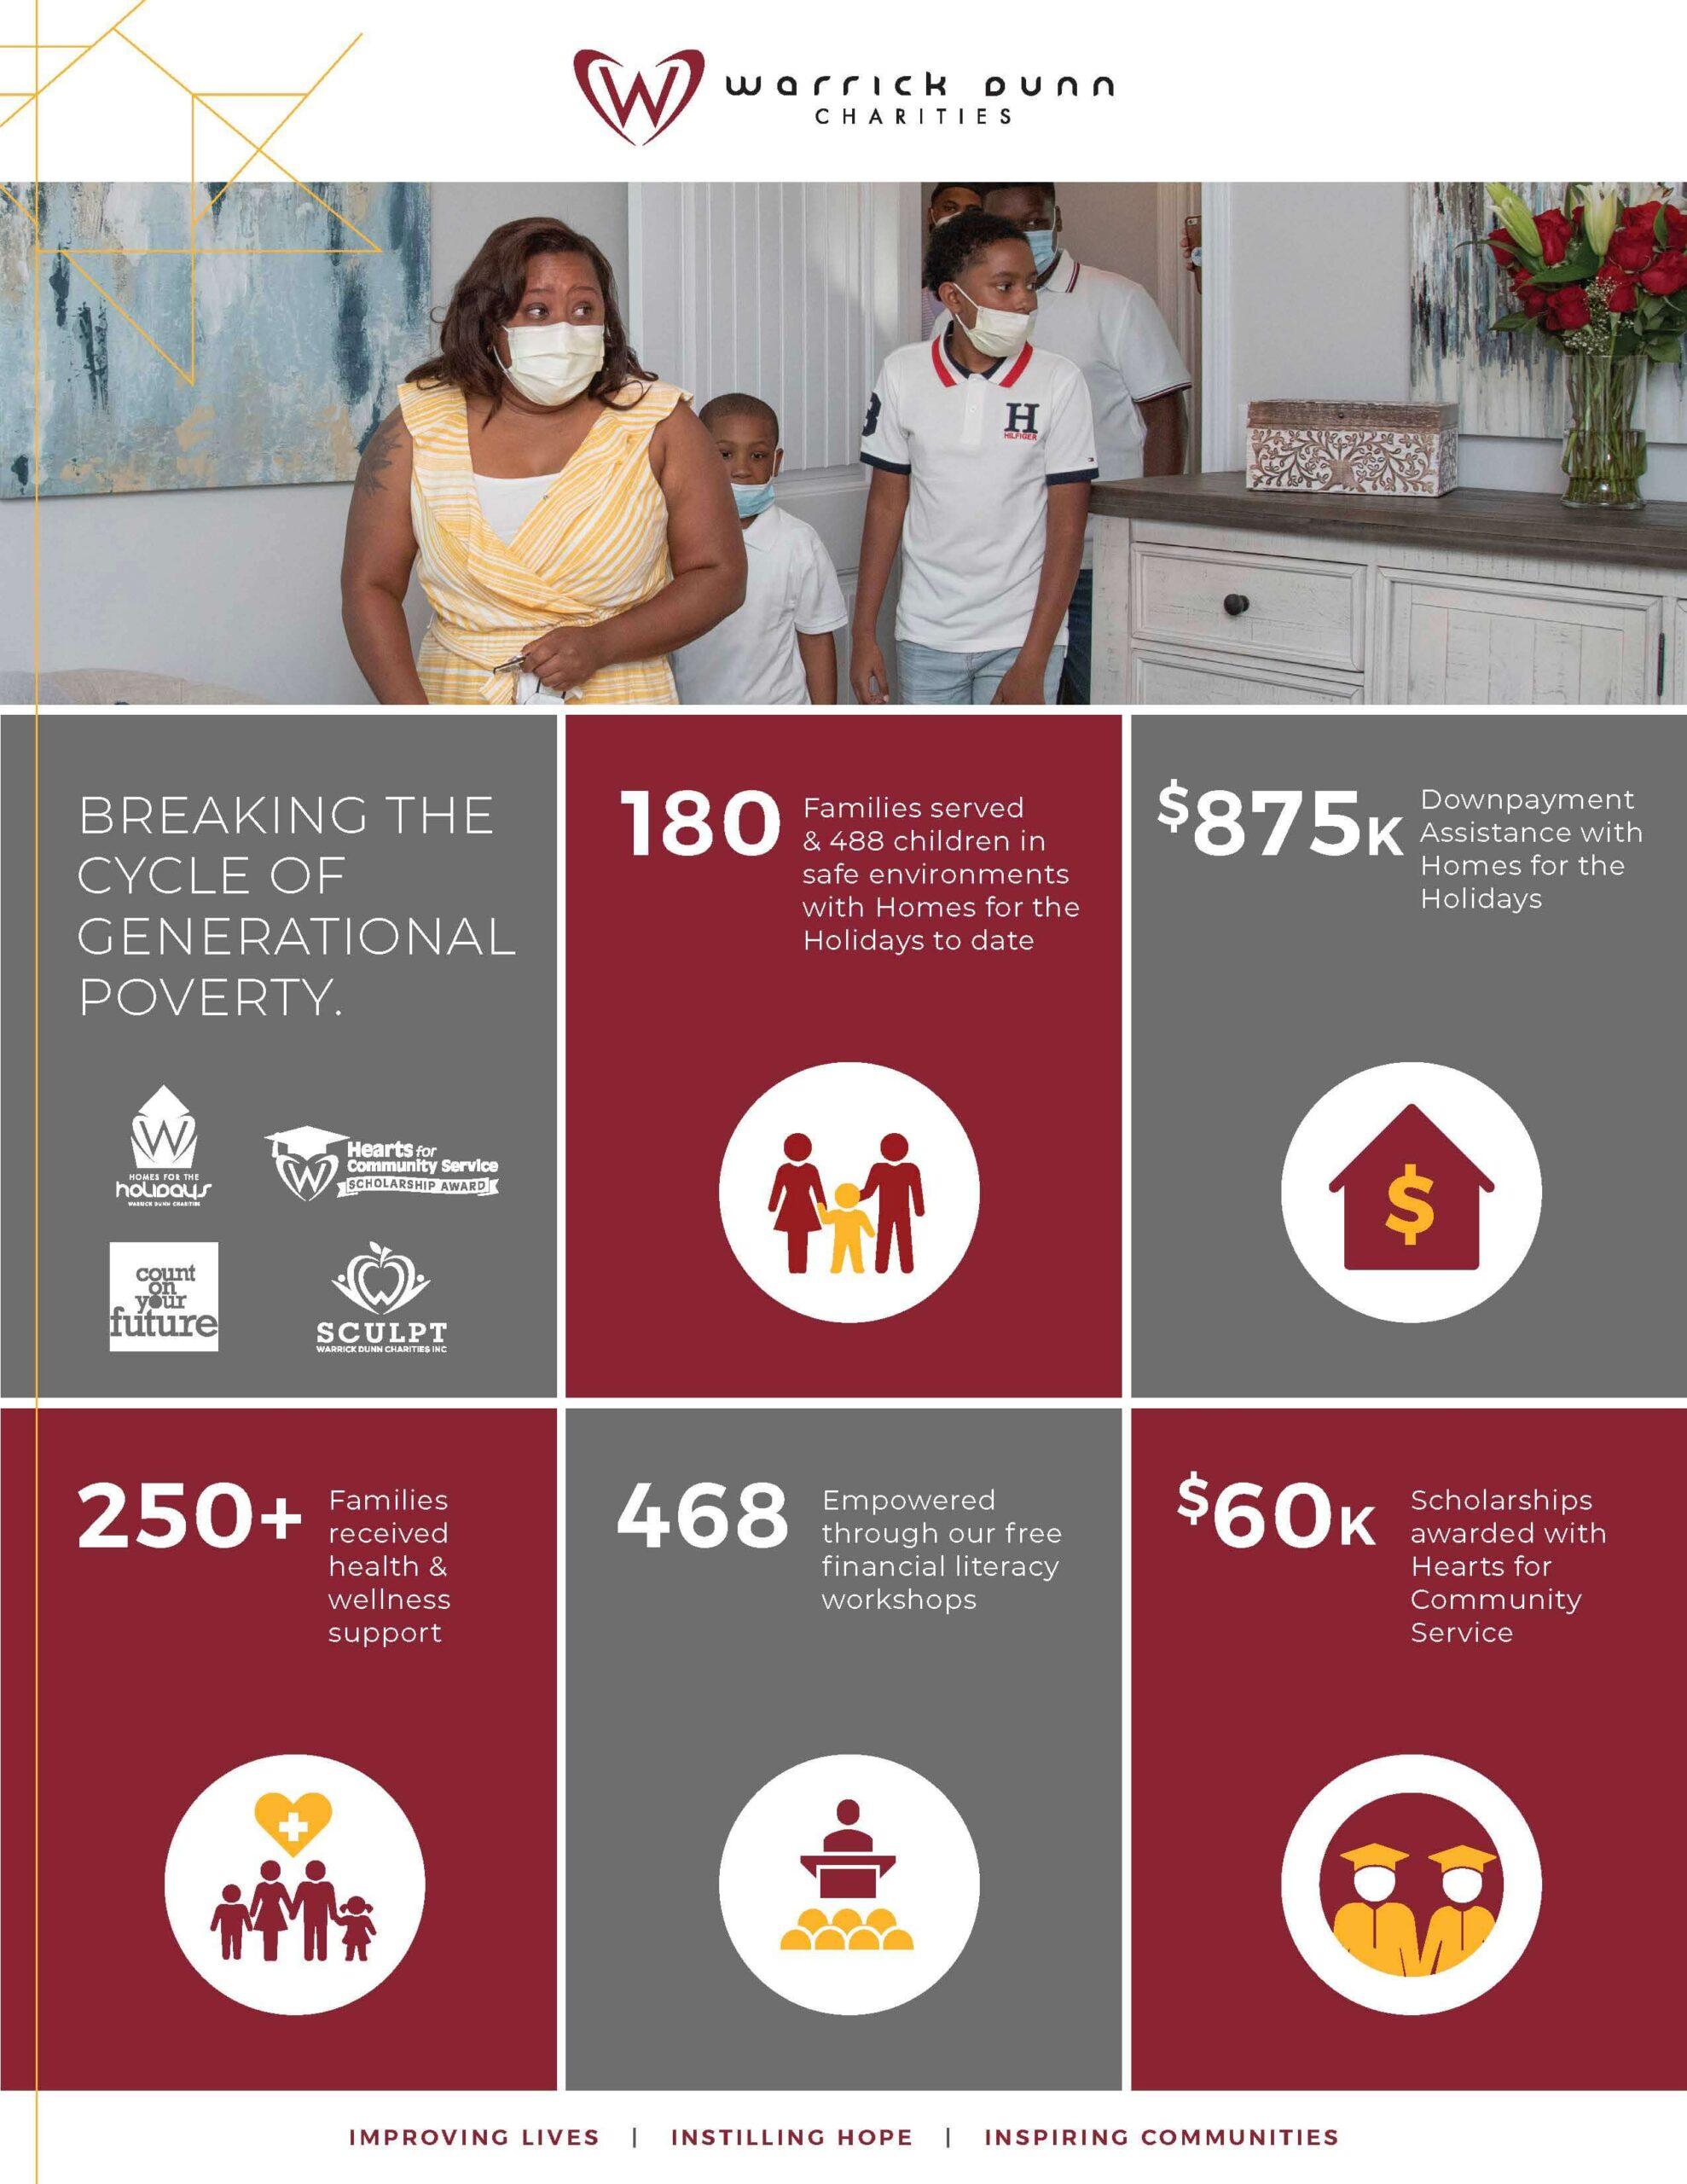 Warrick Dunn Charities impact to date, August 8th, 2020.